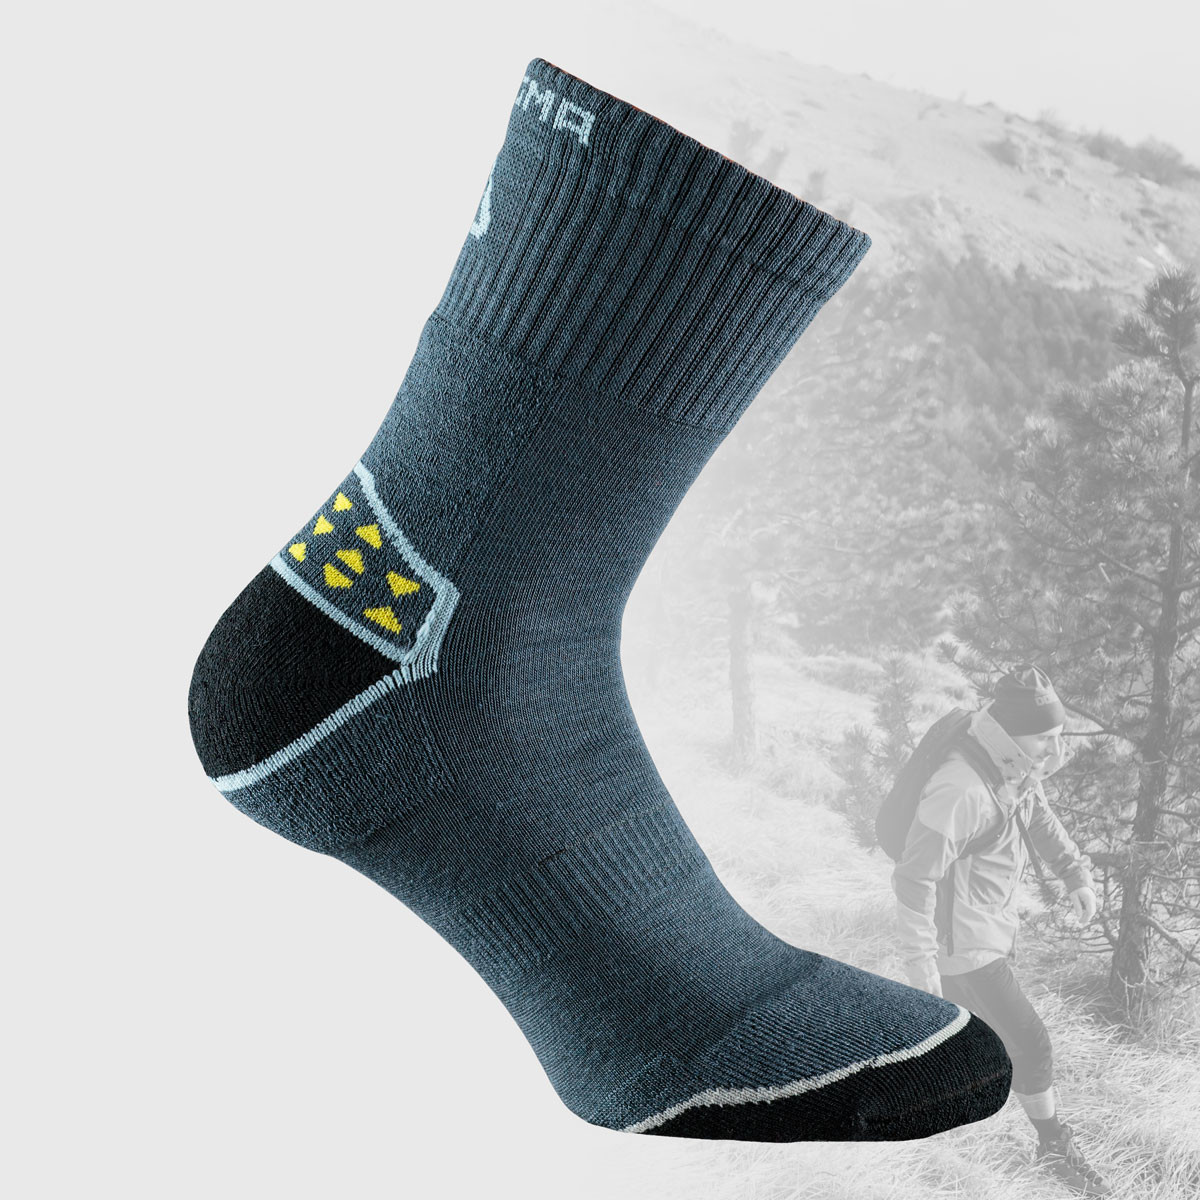 grey hiking socks